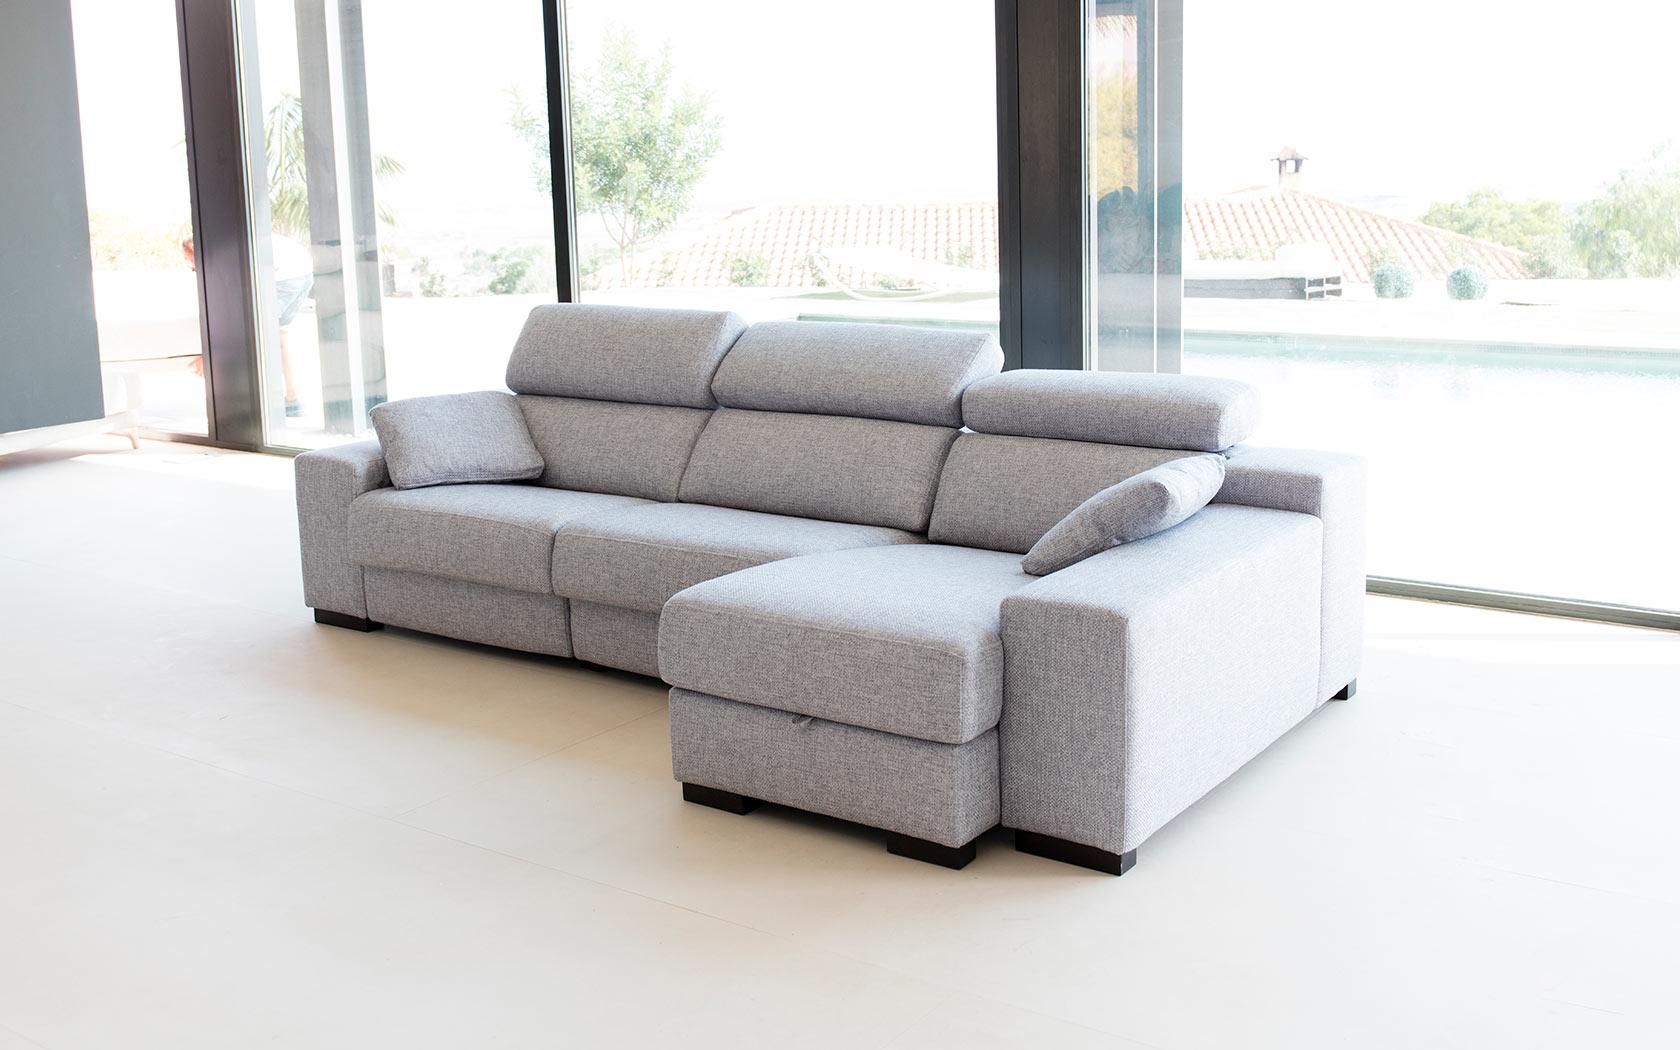 Loto sofá Relax 2019 03